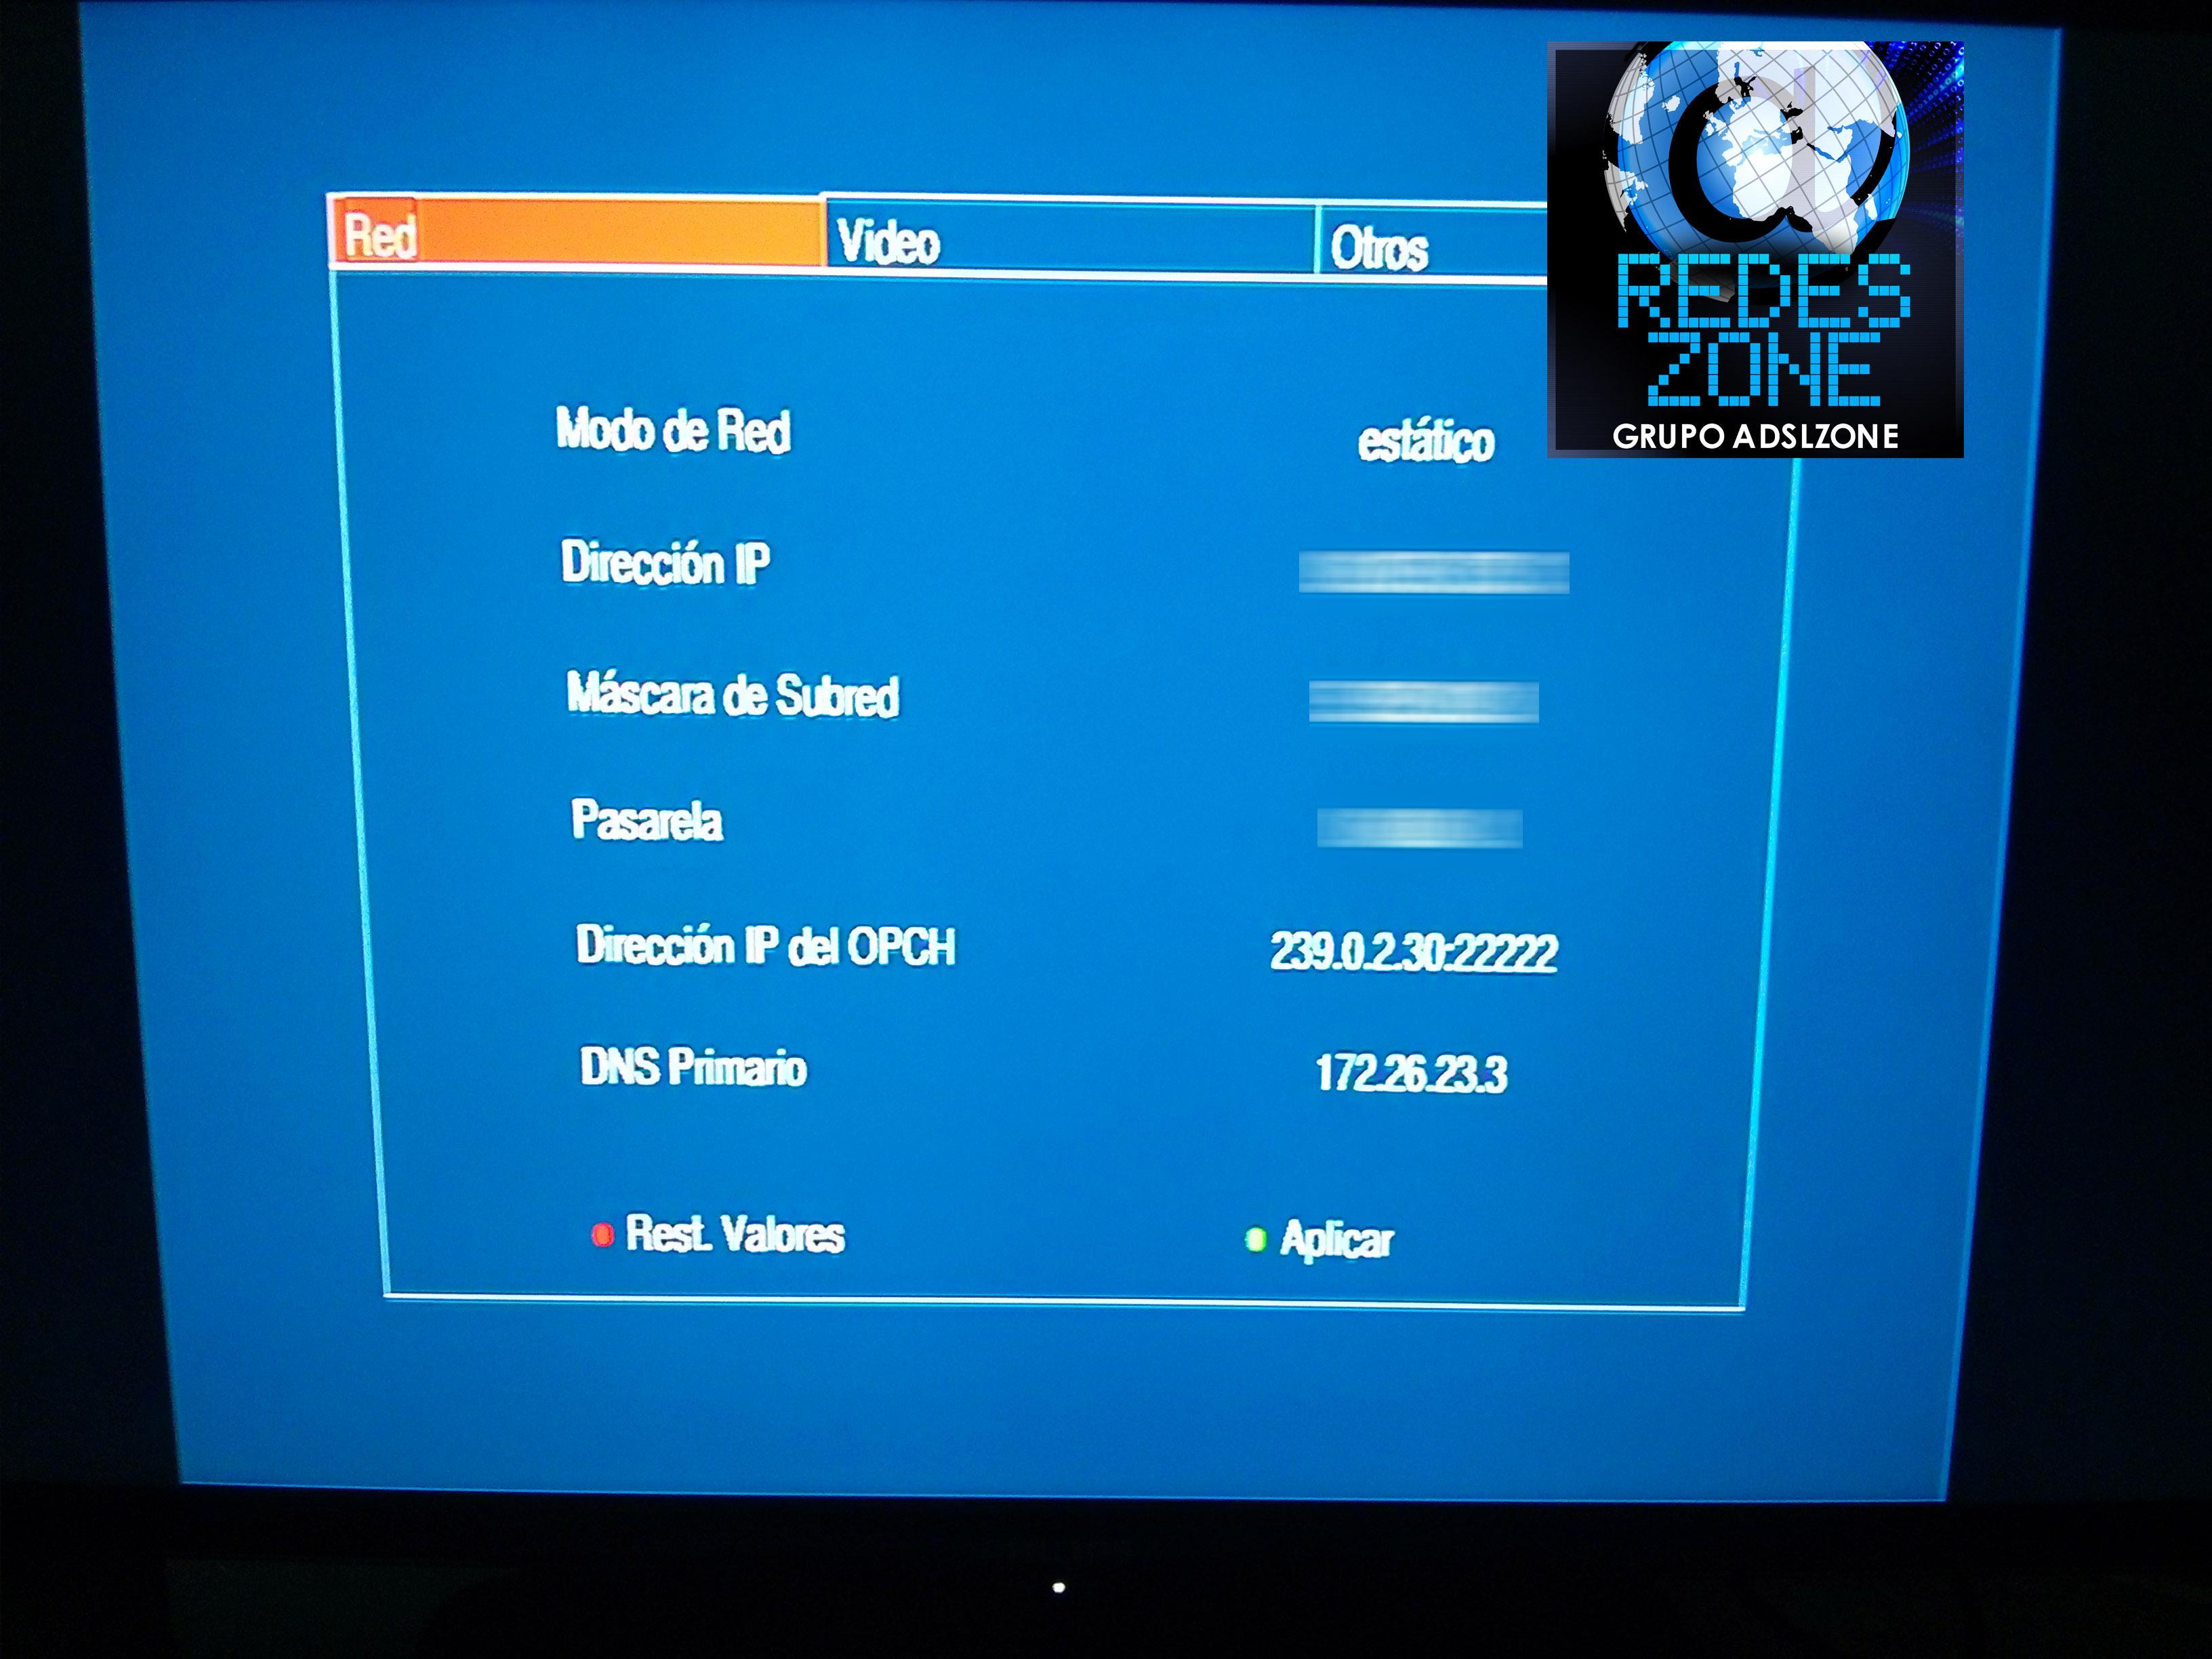 Como Configurar IPTV Movistar TV Del FTTH De Movistar